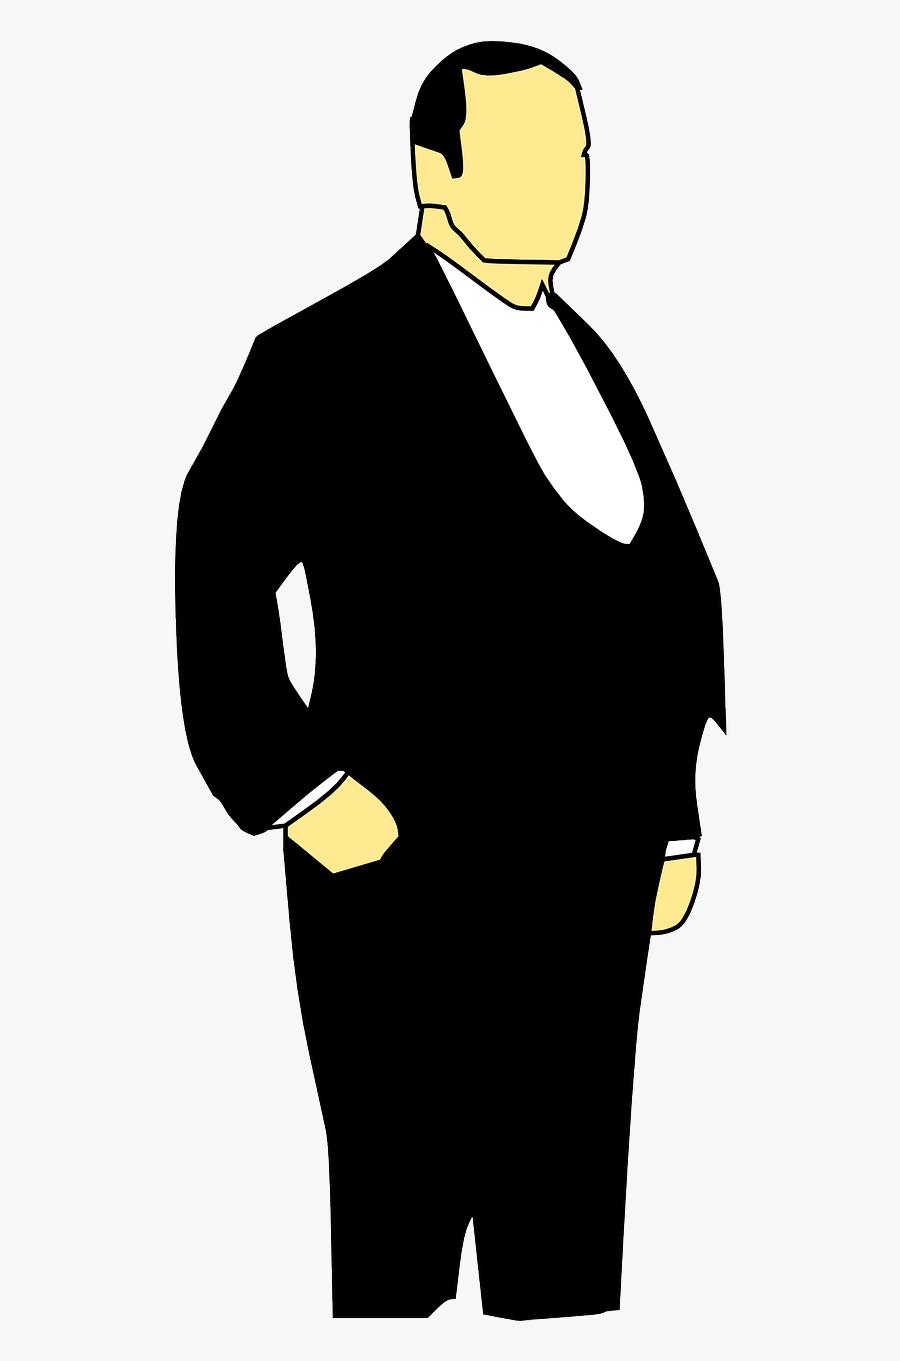 Tux Man Fat Free Picture - Fat Man In Suit Clipart, Transparent Clipart